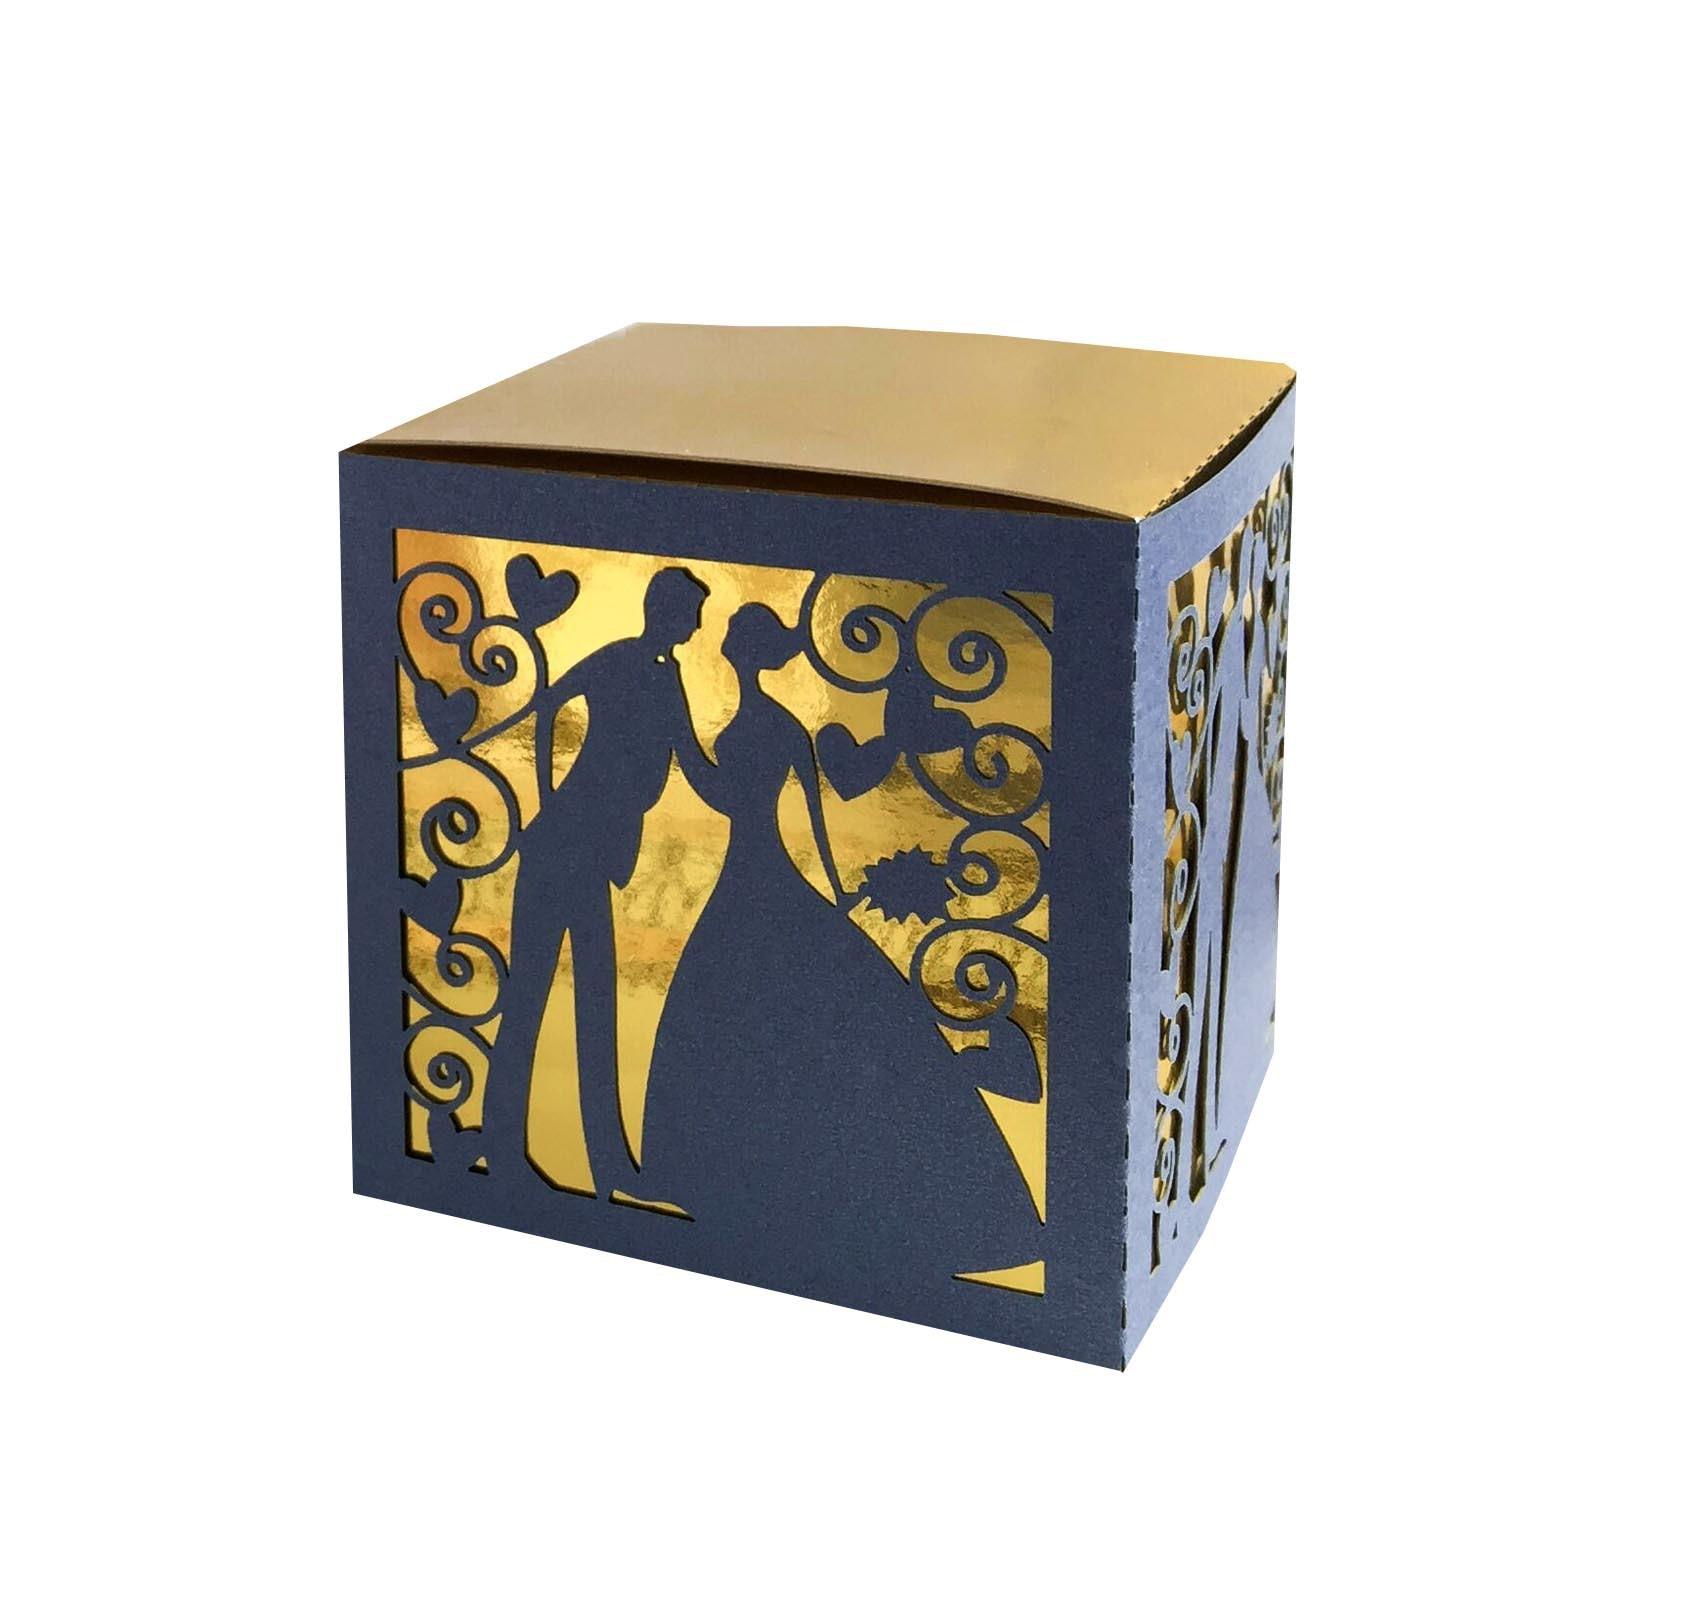 Caja de dulces de boda con nota de música cortada con láser cajas de cinta de embalaje de Chocolate dulce para suministros de decoración de ducha de bebé para fiesta de boda